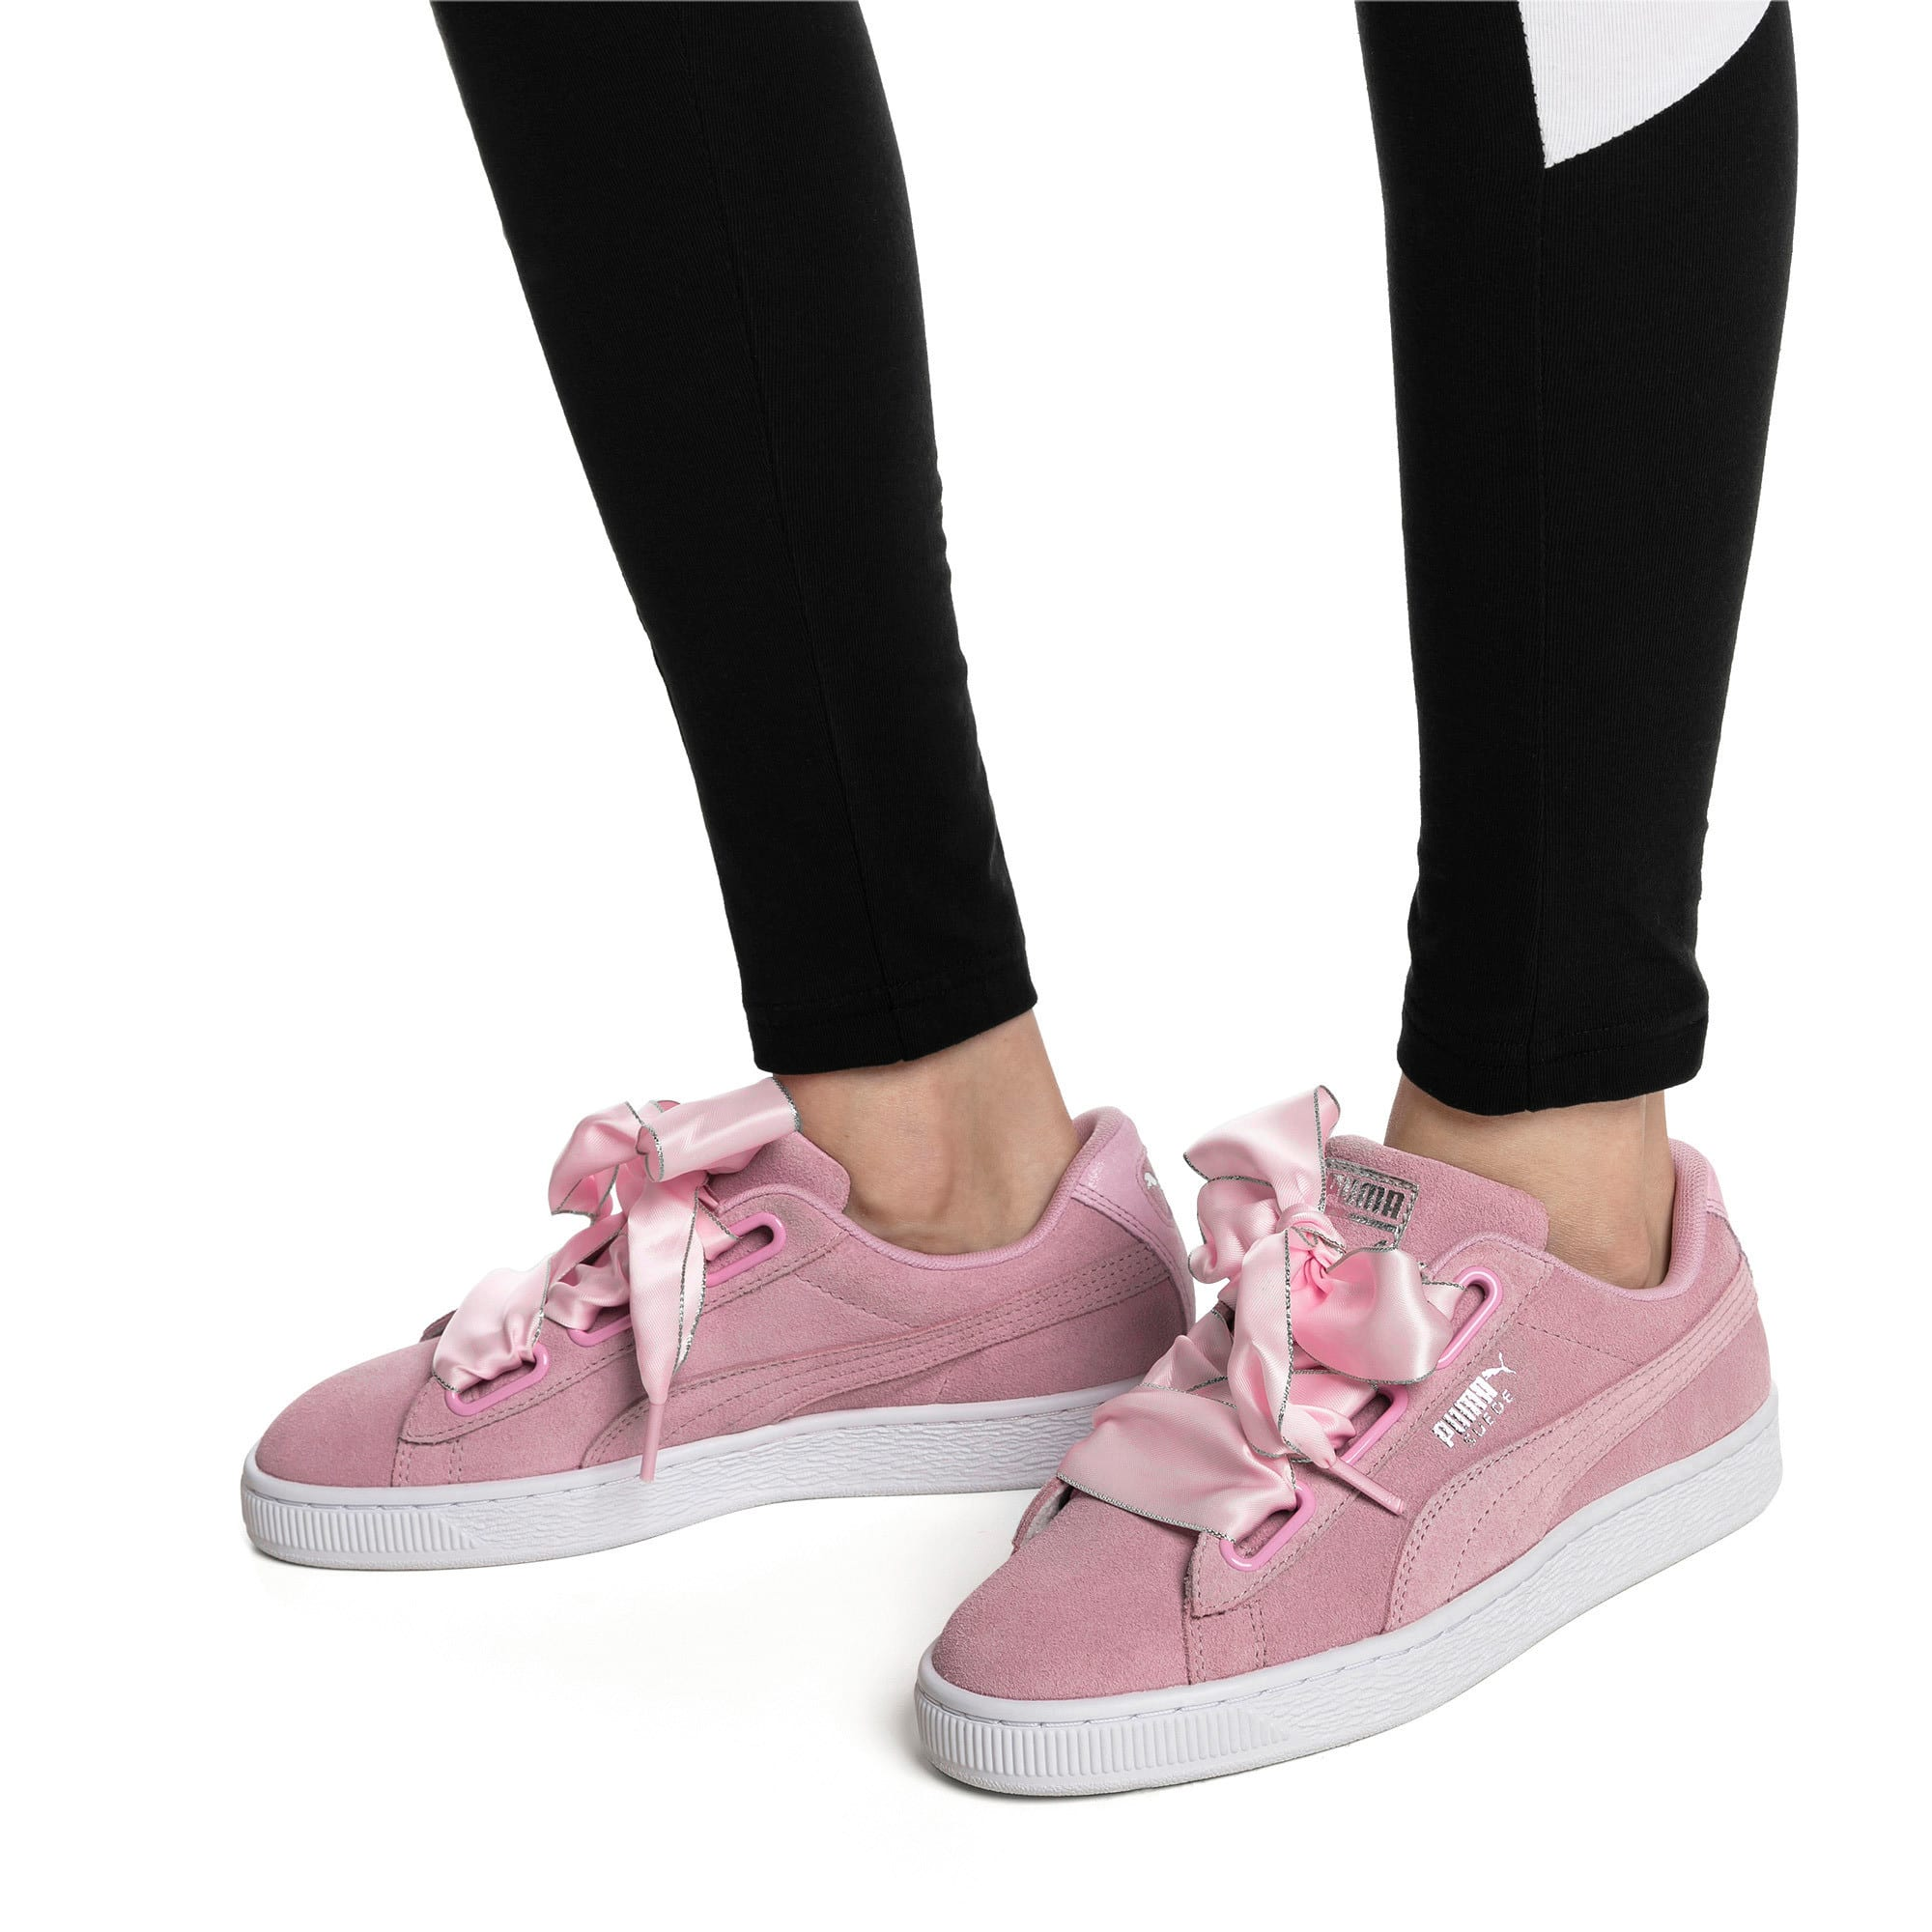 innovative design df53c f4645 Suede Heart Galaxy Women's Sneakers